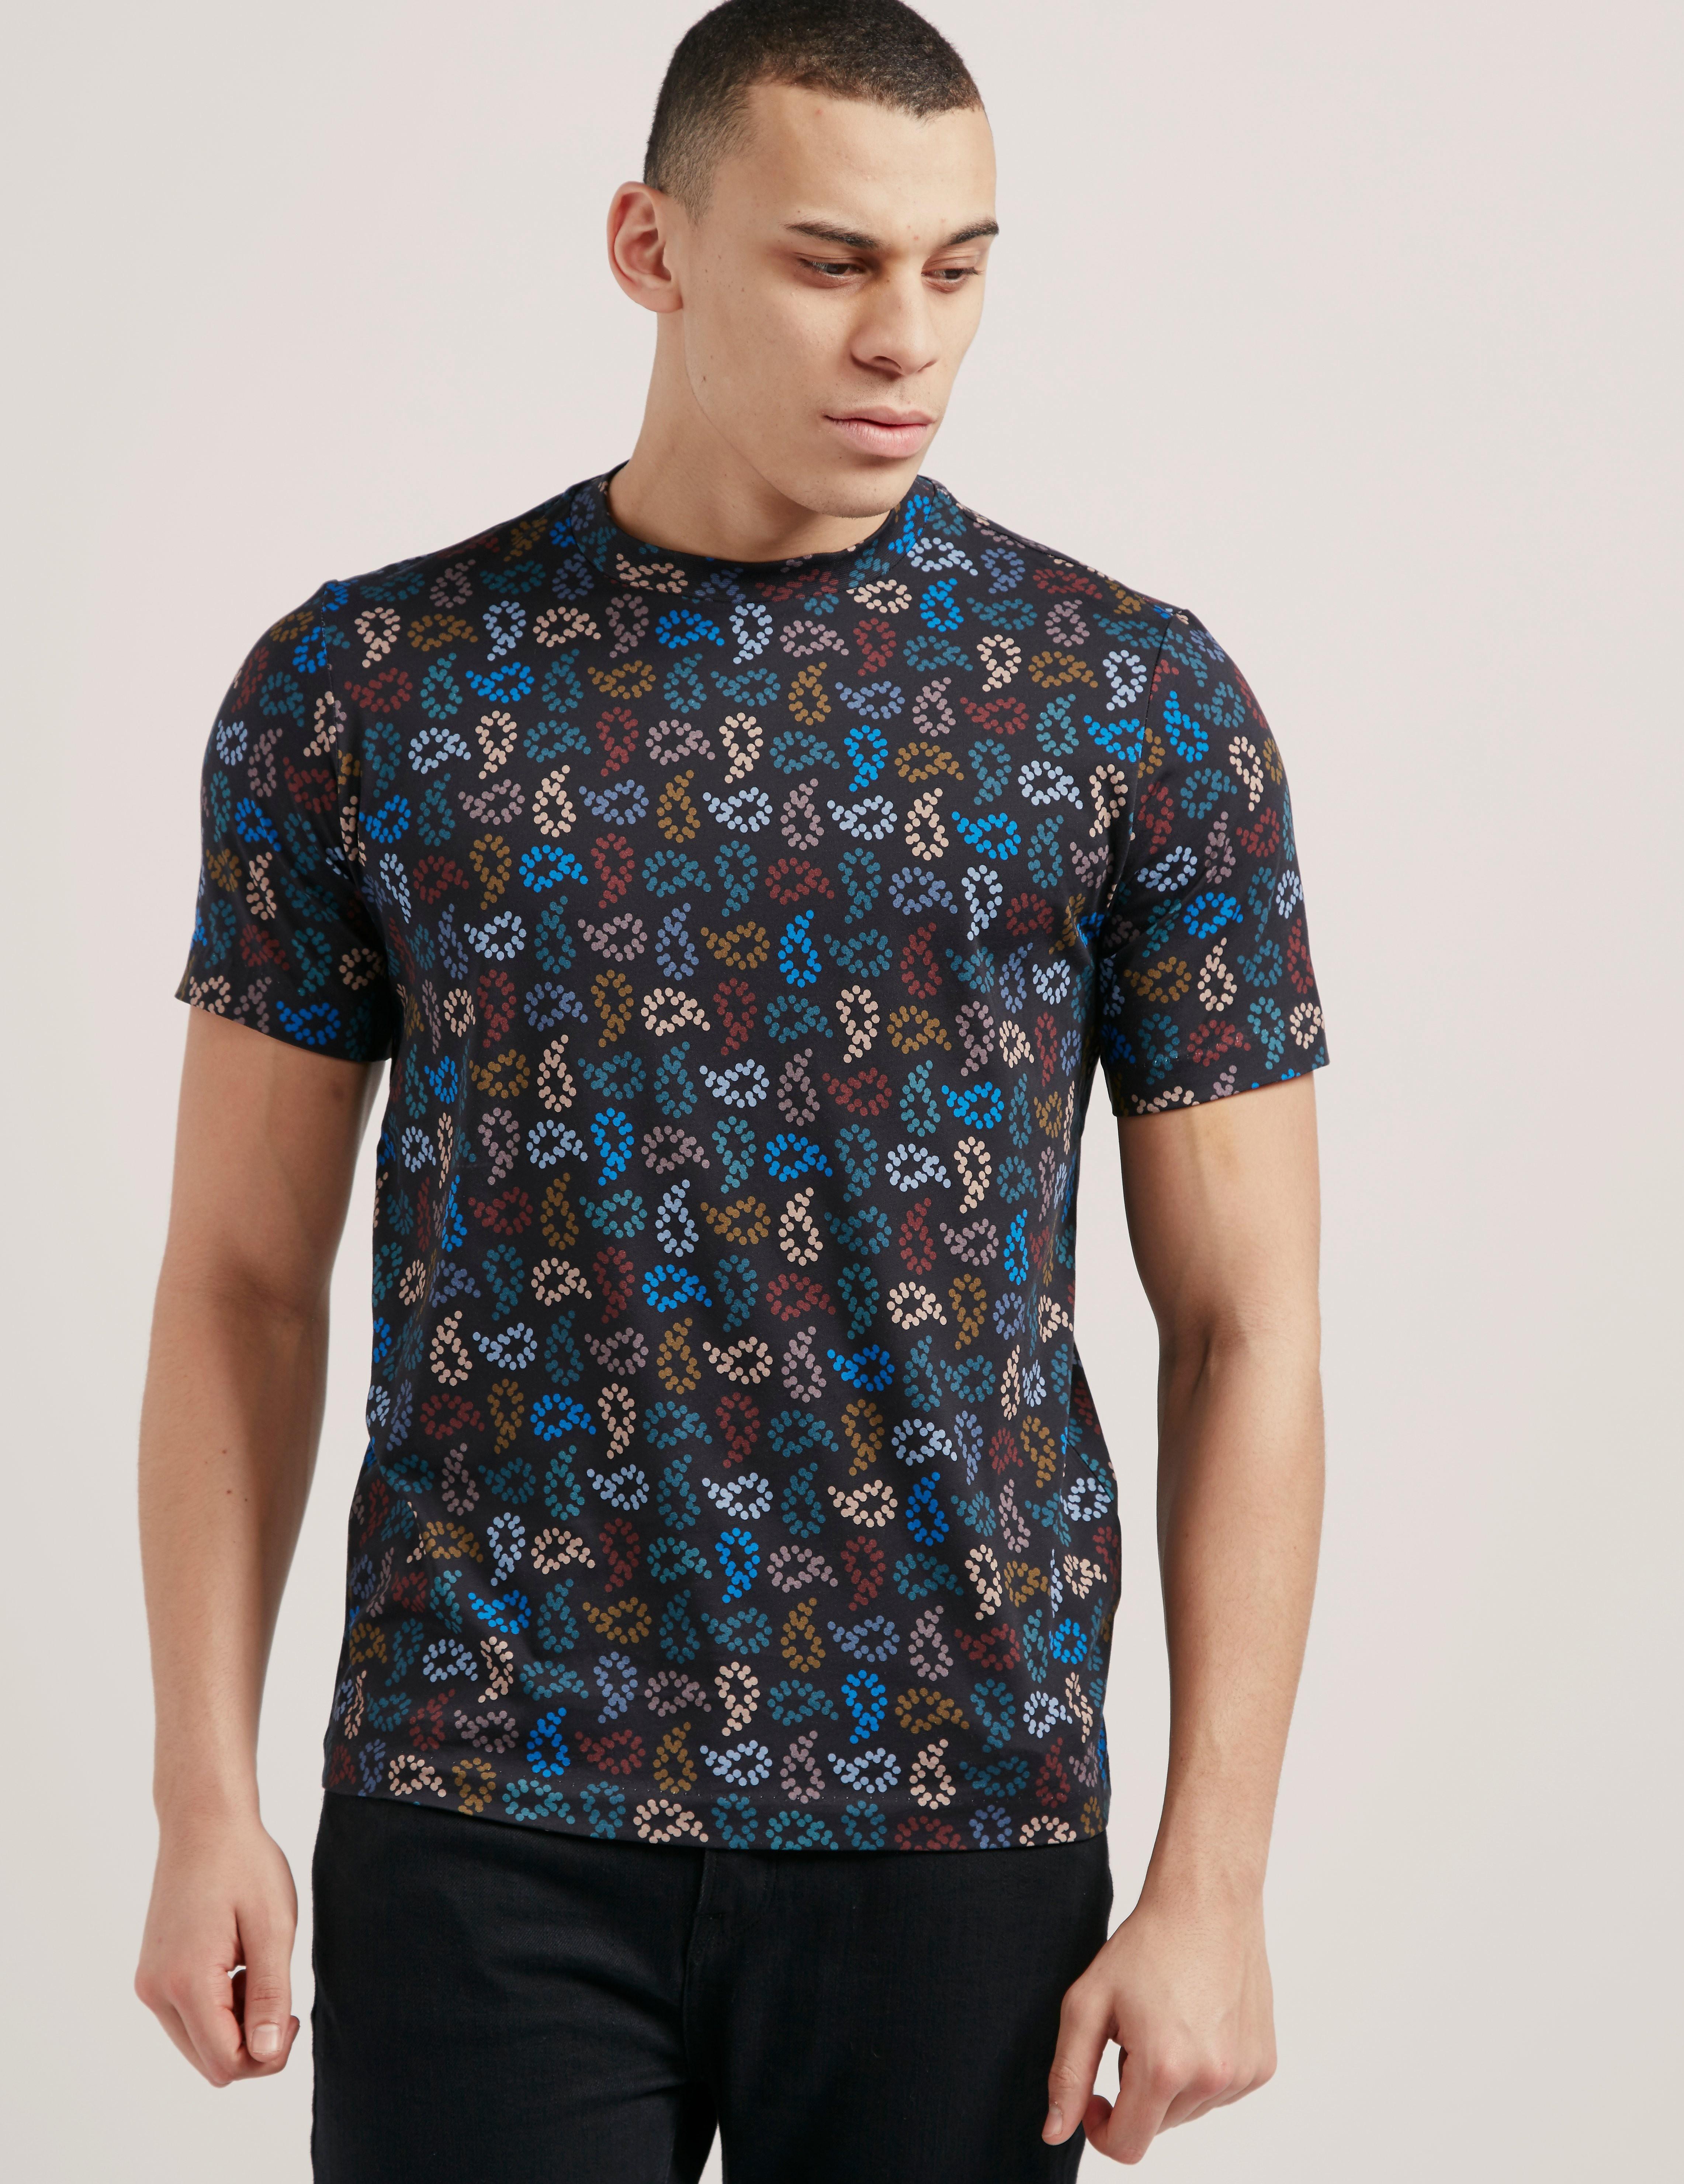 Paul Smith Paisley Short Sleeve T-Shirt